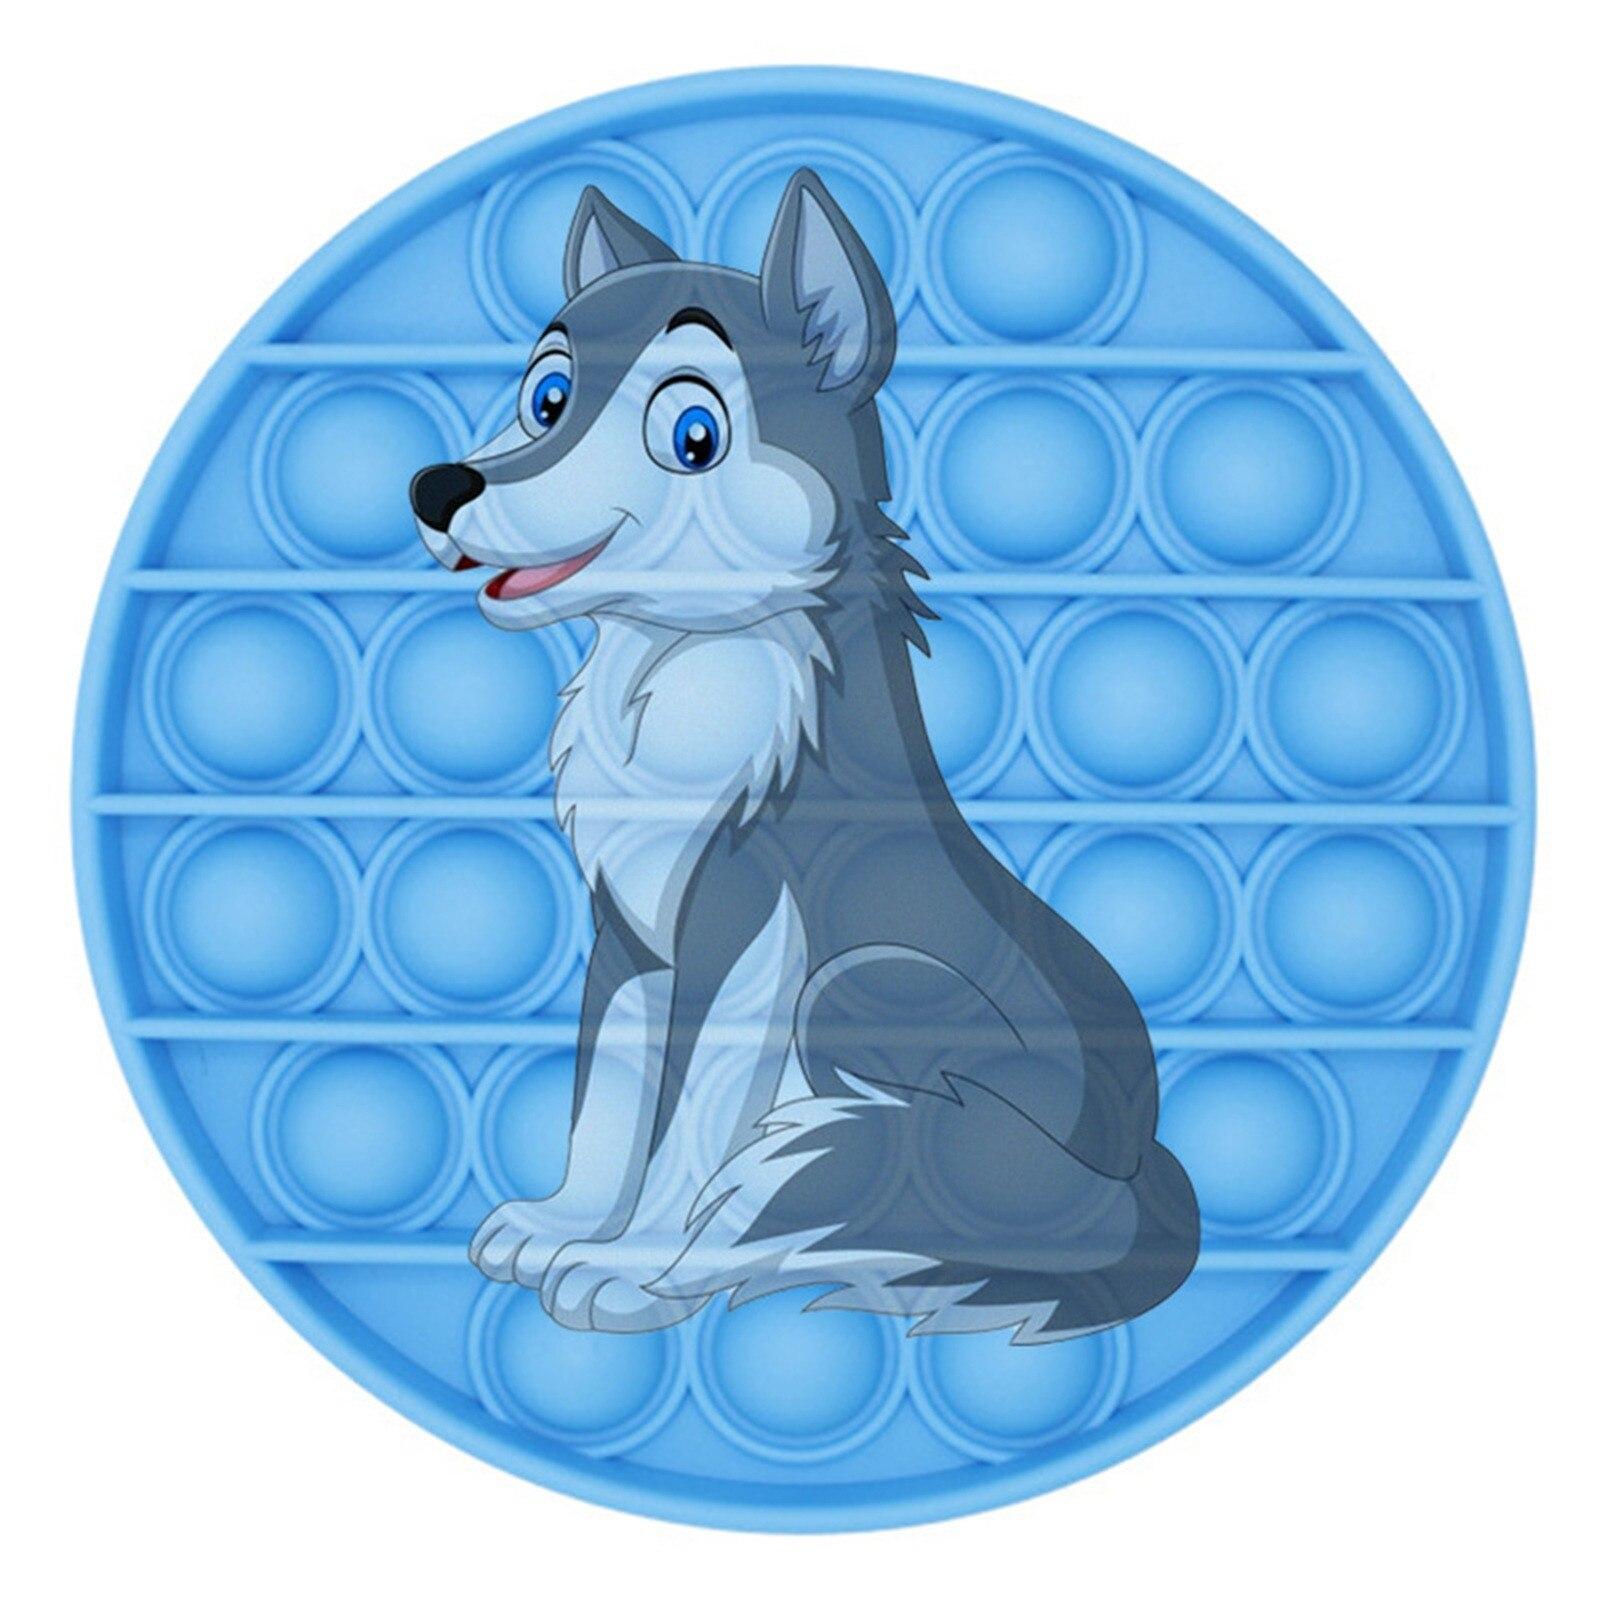 pop it wolf image fidget toy 3241 - Wacky Track